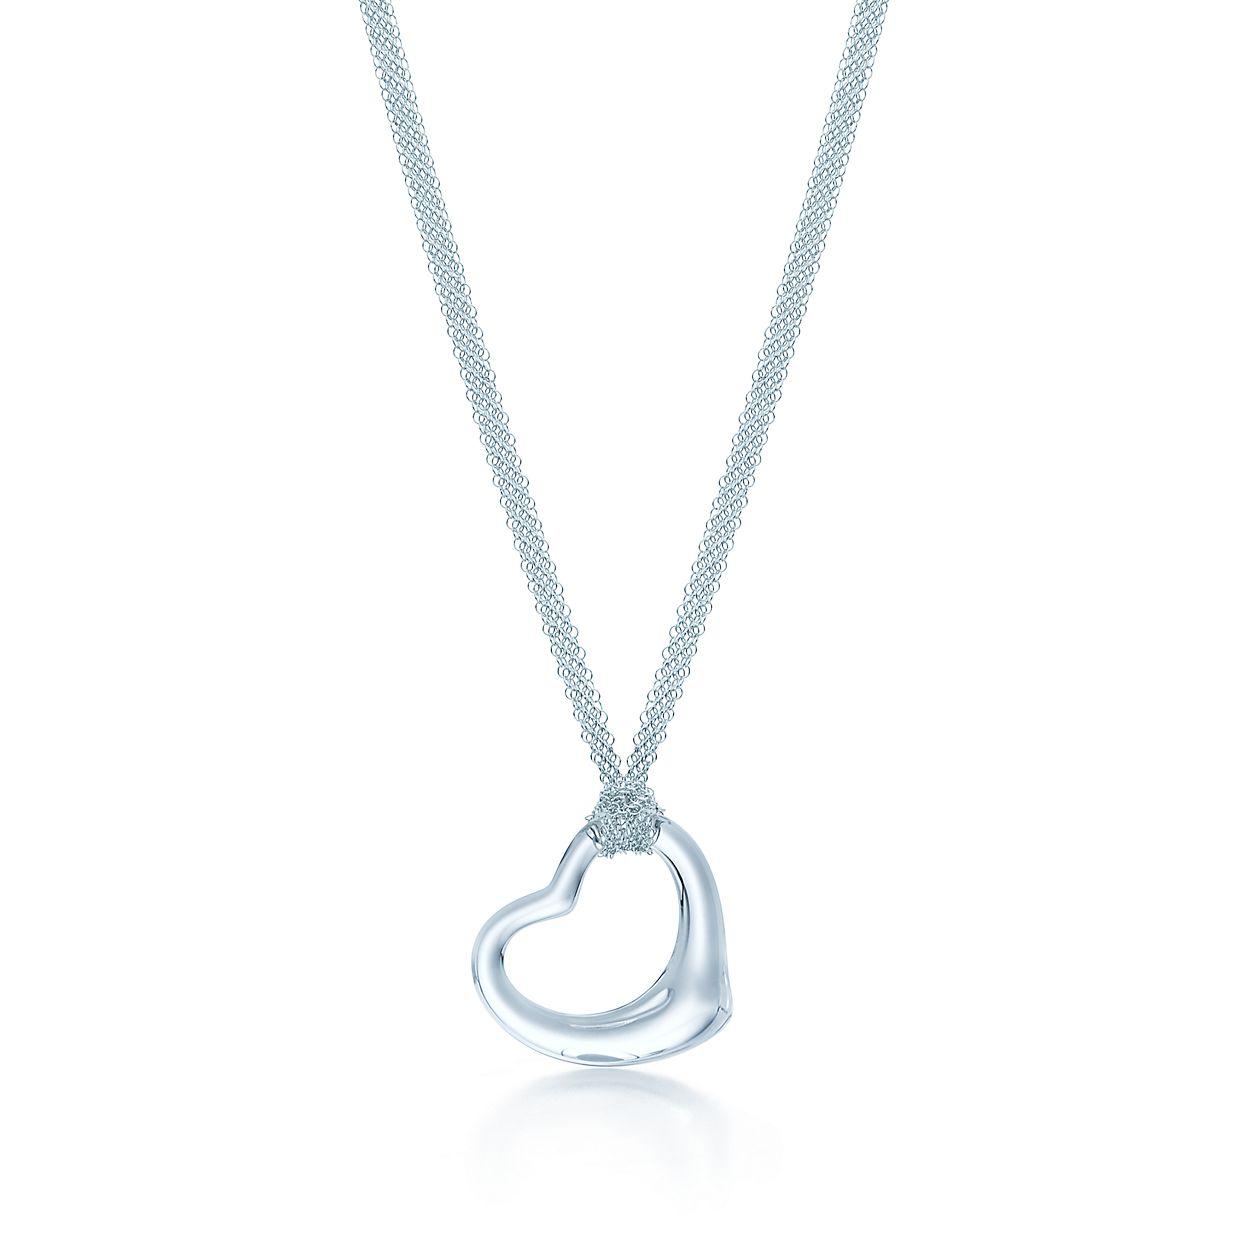 Elsa peretti open heart pendant of rock crystal and sterling silver elsa perettiopen heart pendant aloadofball Choice Image